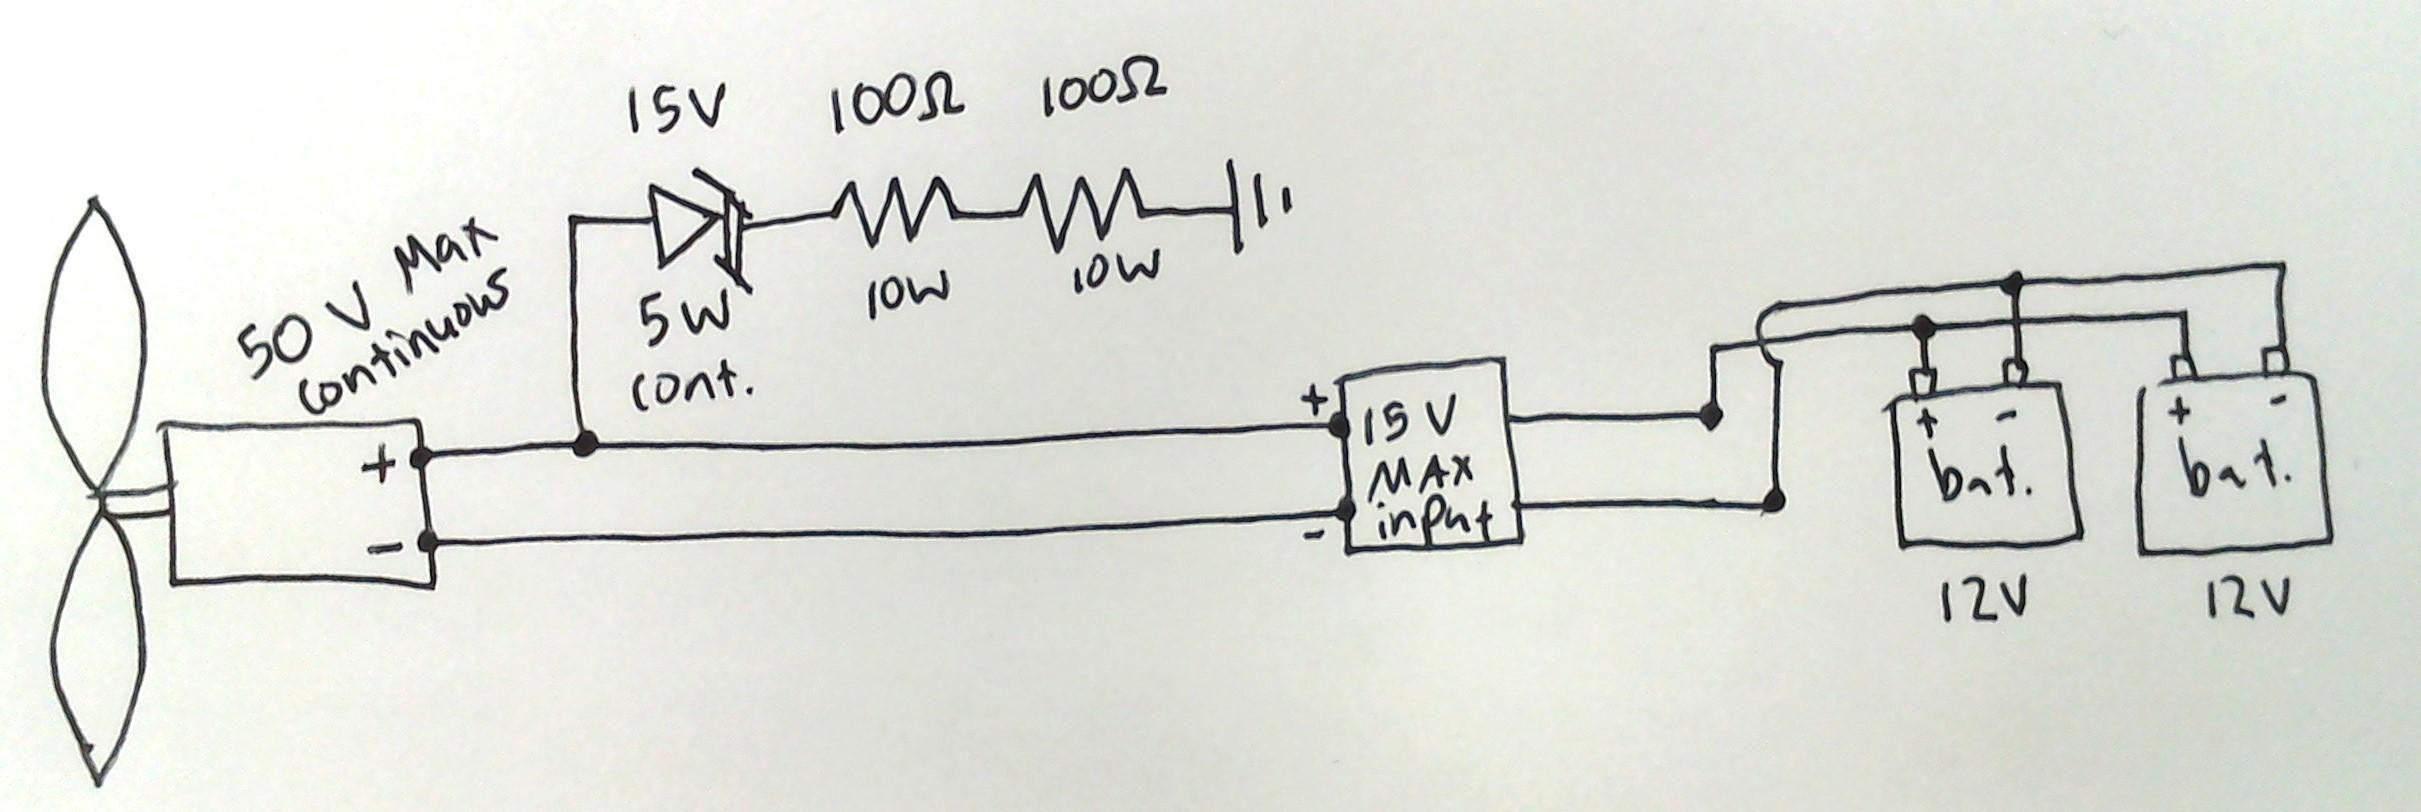 24 volt generator regulator wiring diagram ge 2183  wind regulator schematics free diagram  wind regulator schematics free diagram